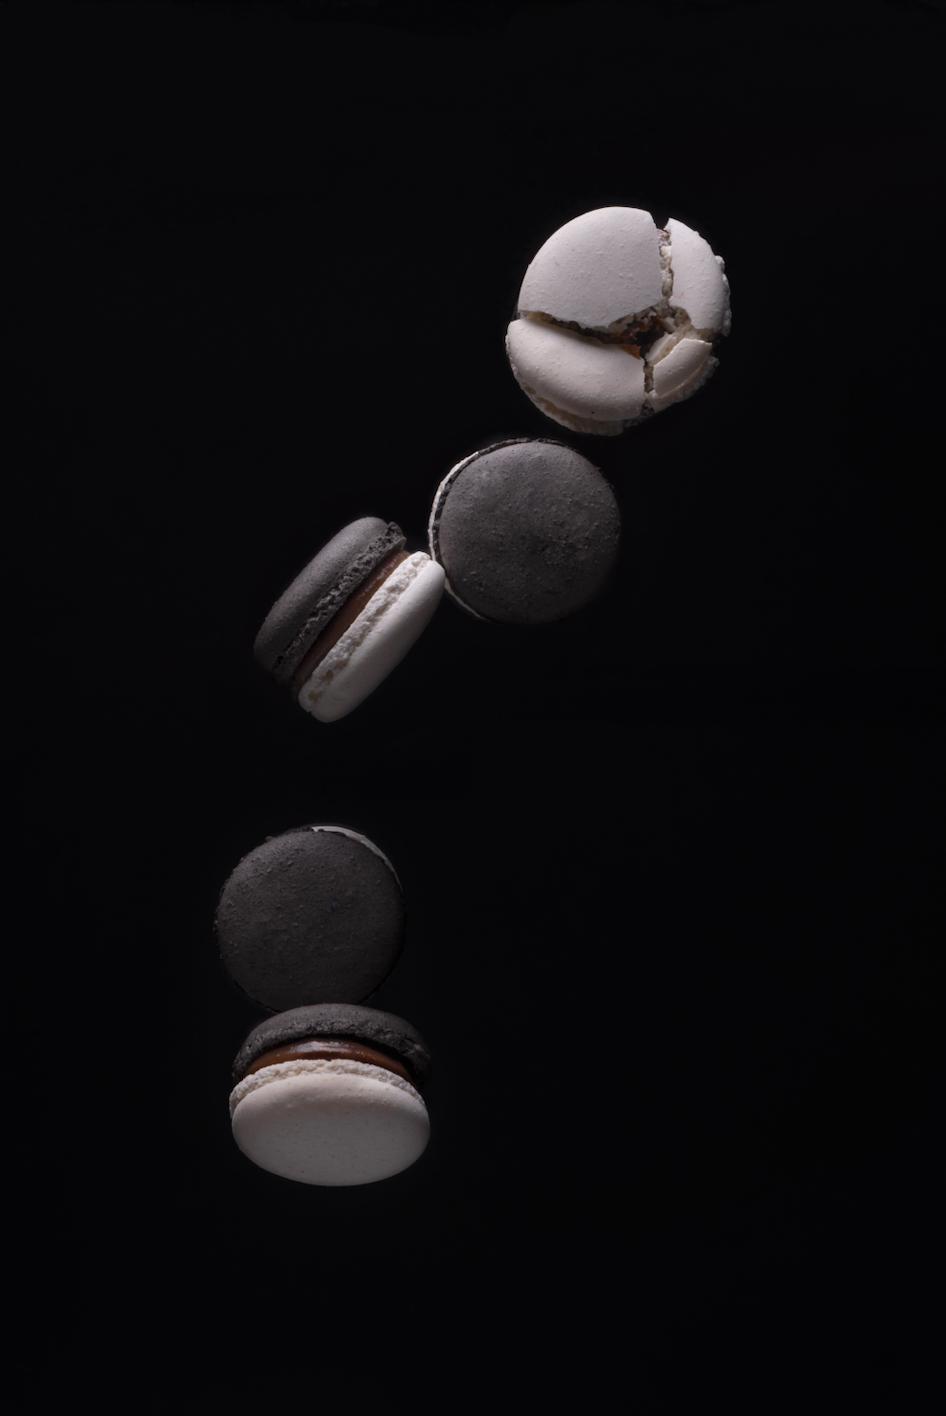 Macaron de Regaliz